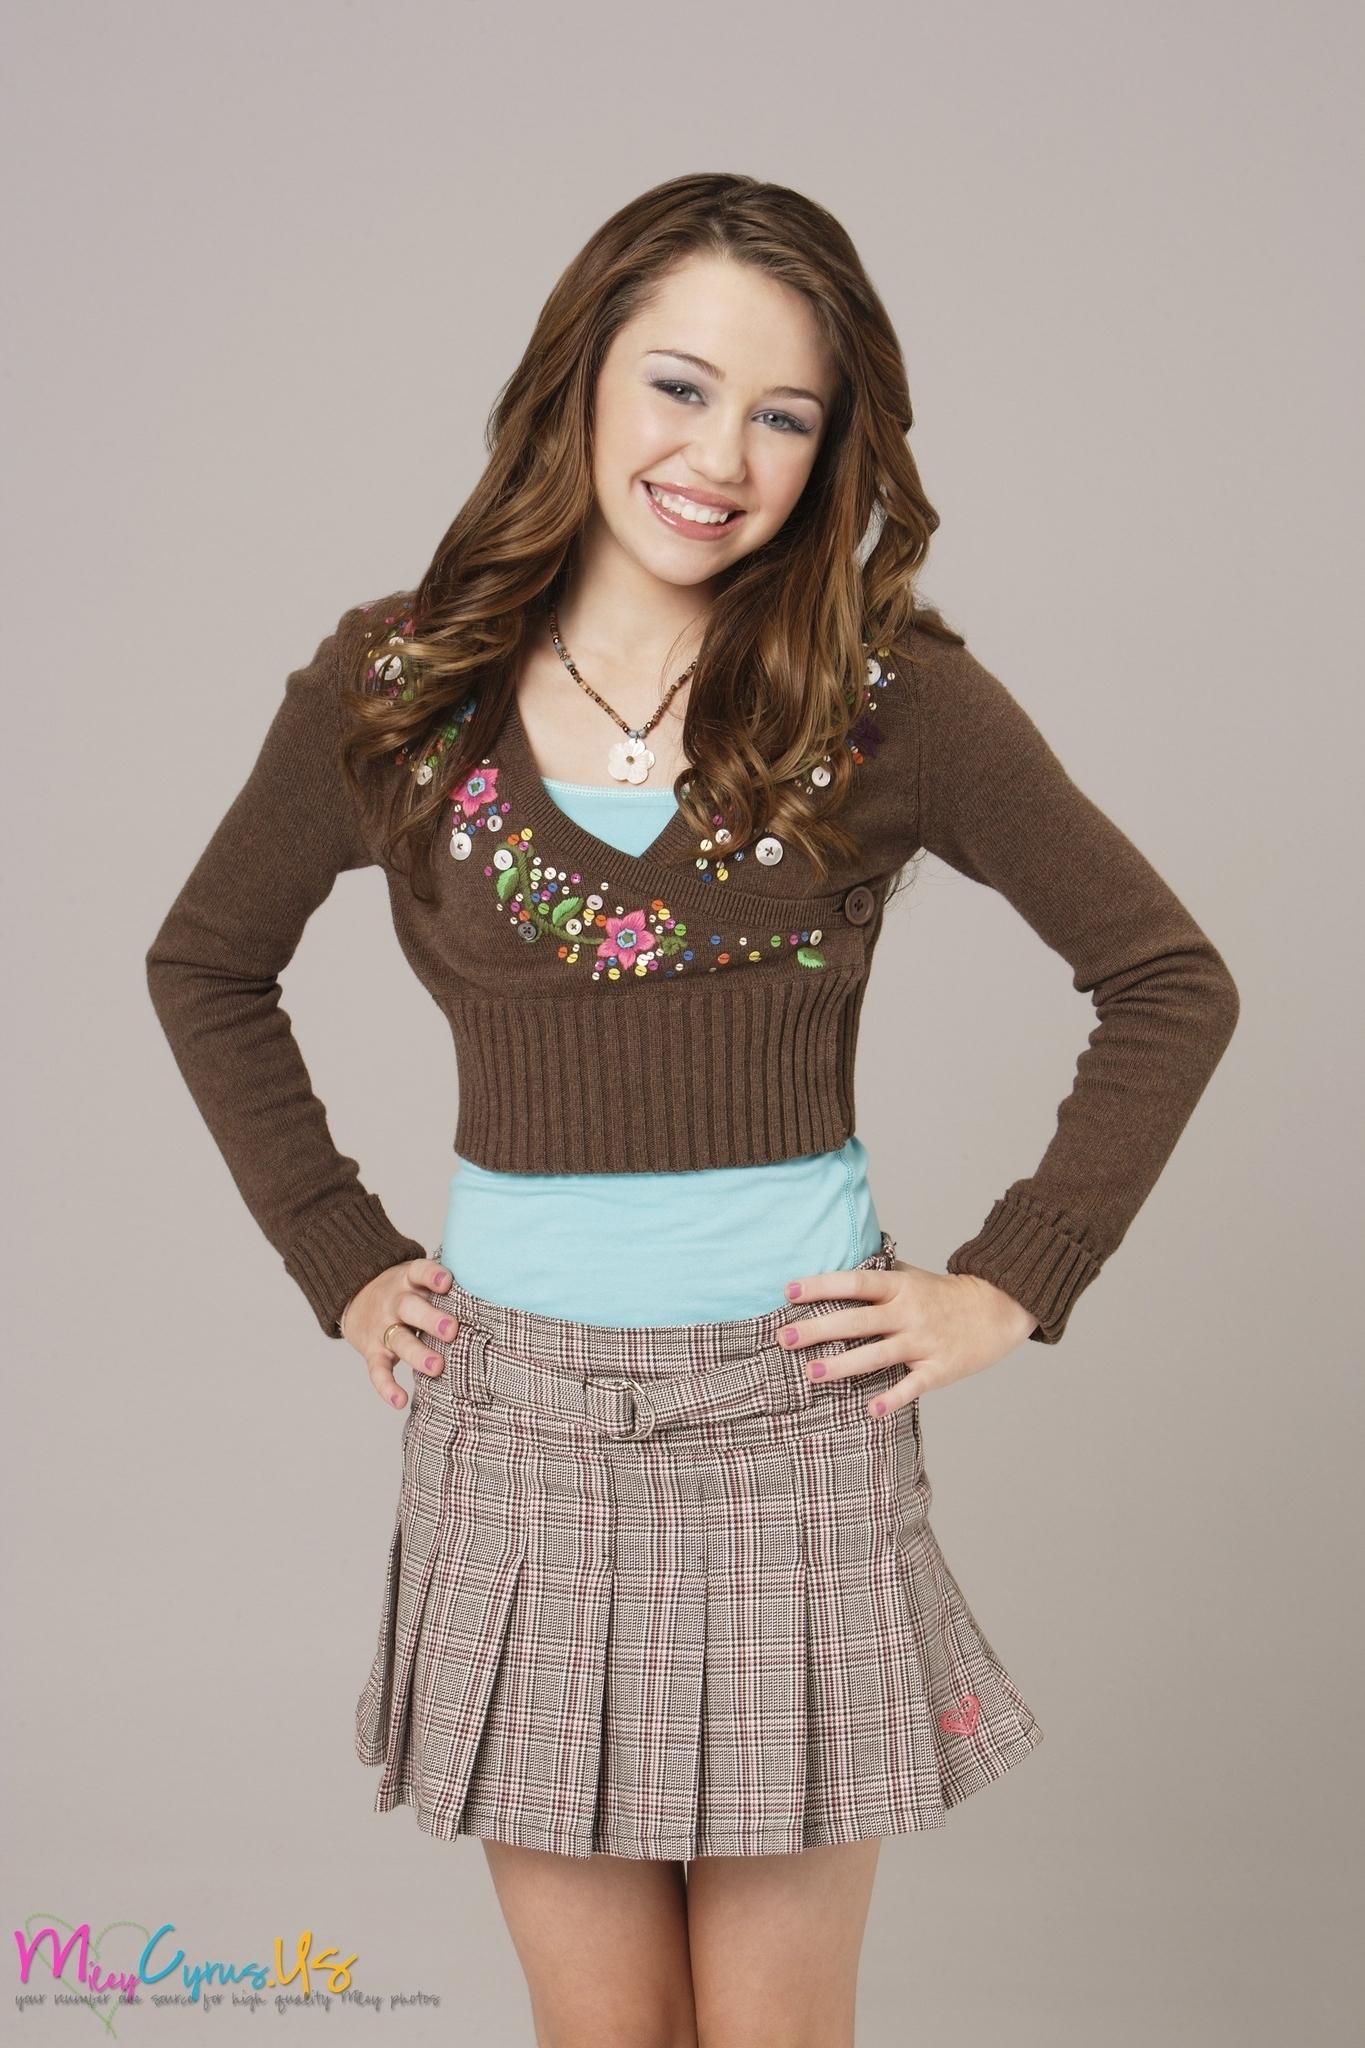 Hannah Montana Season 3 Miley Miley Cyrus Hannah Montana